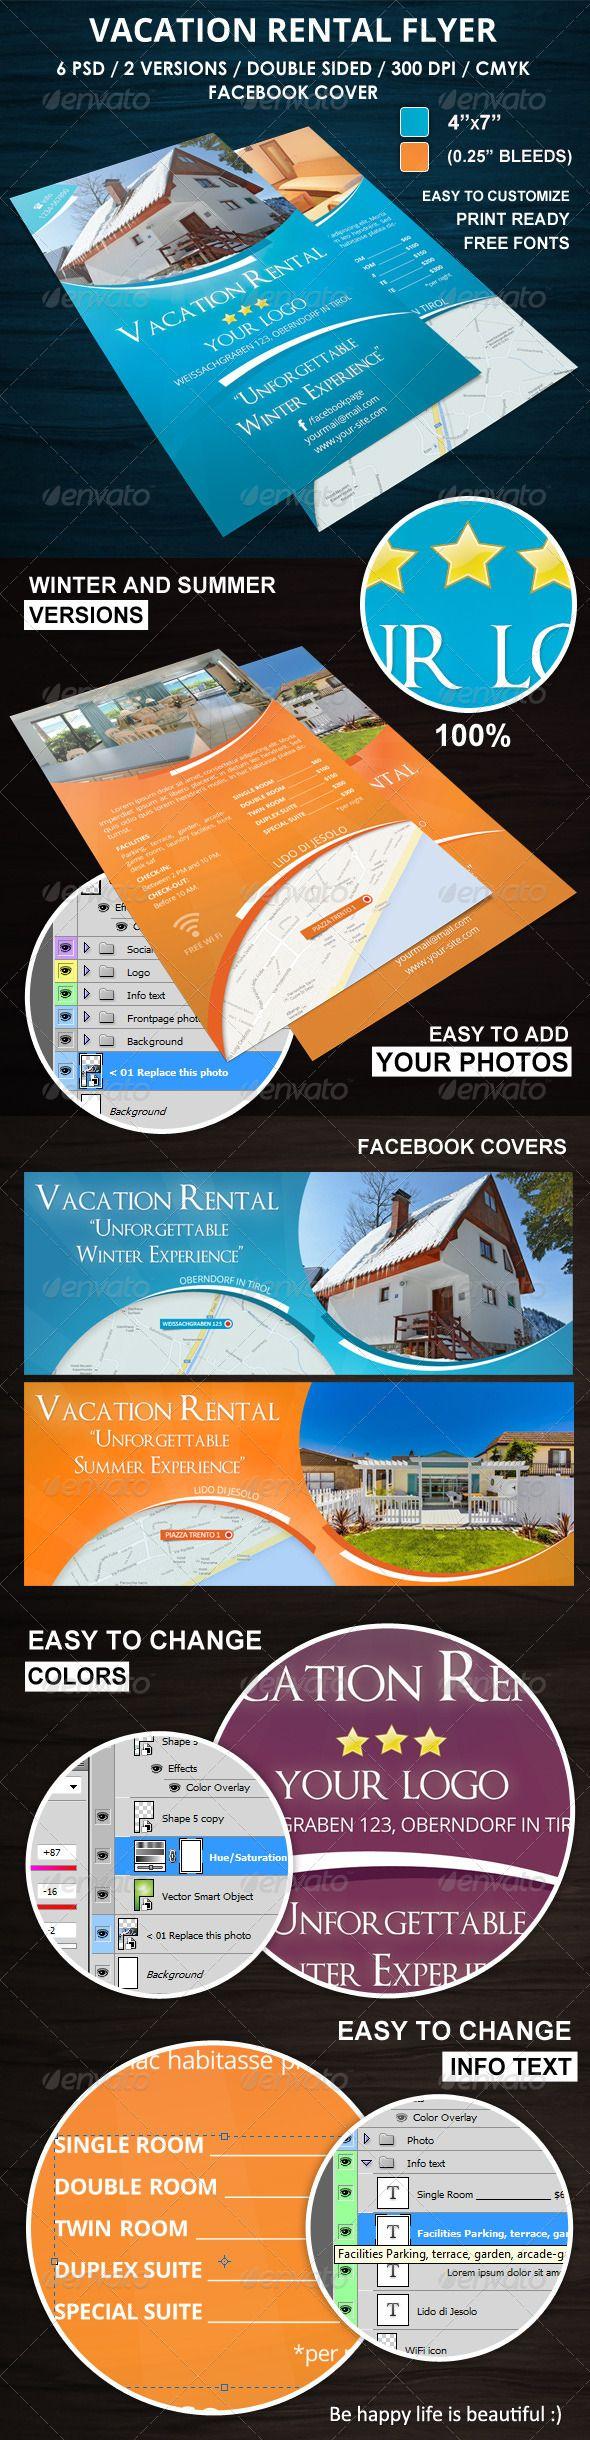 vacation rental flyer corporate flyers travel pinterest